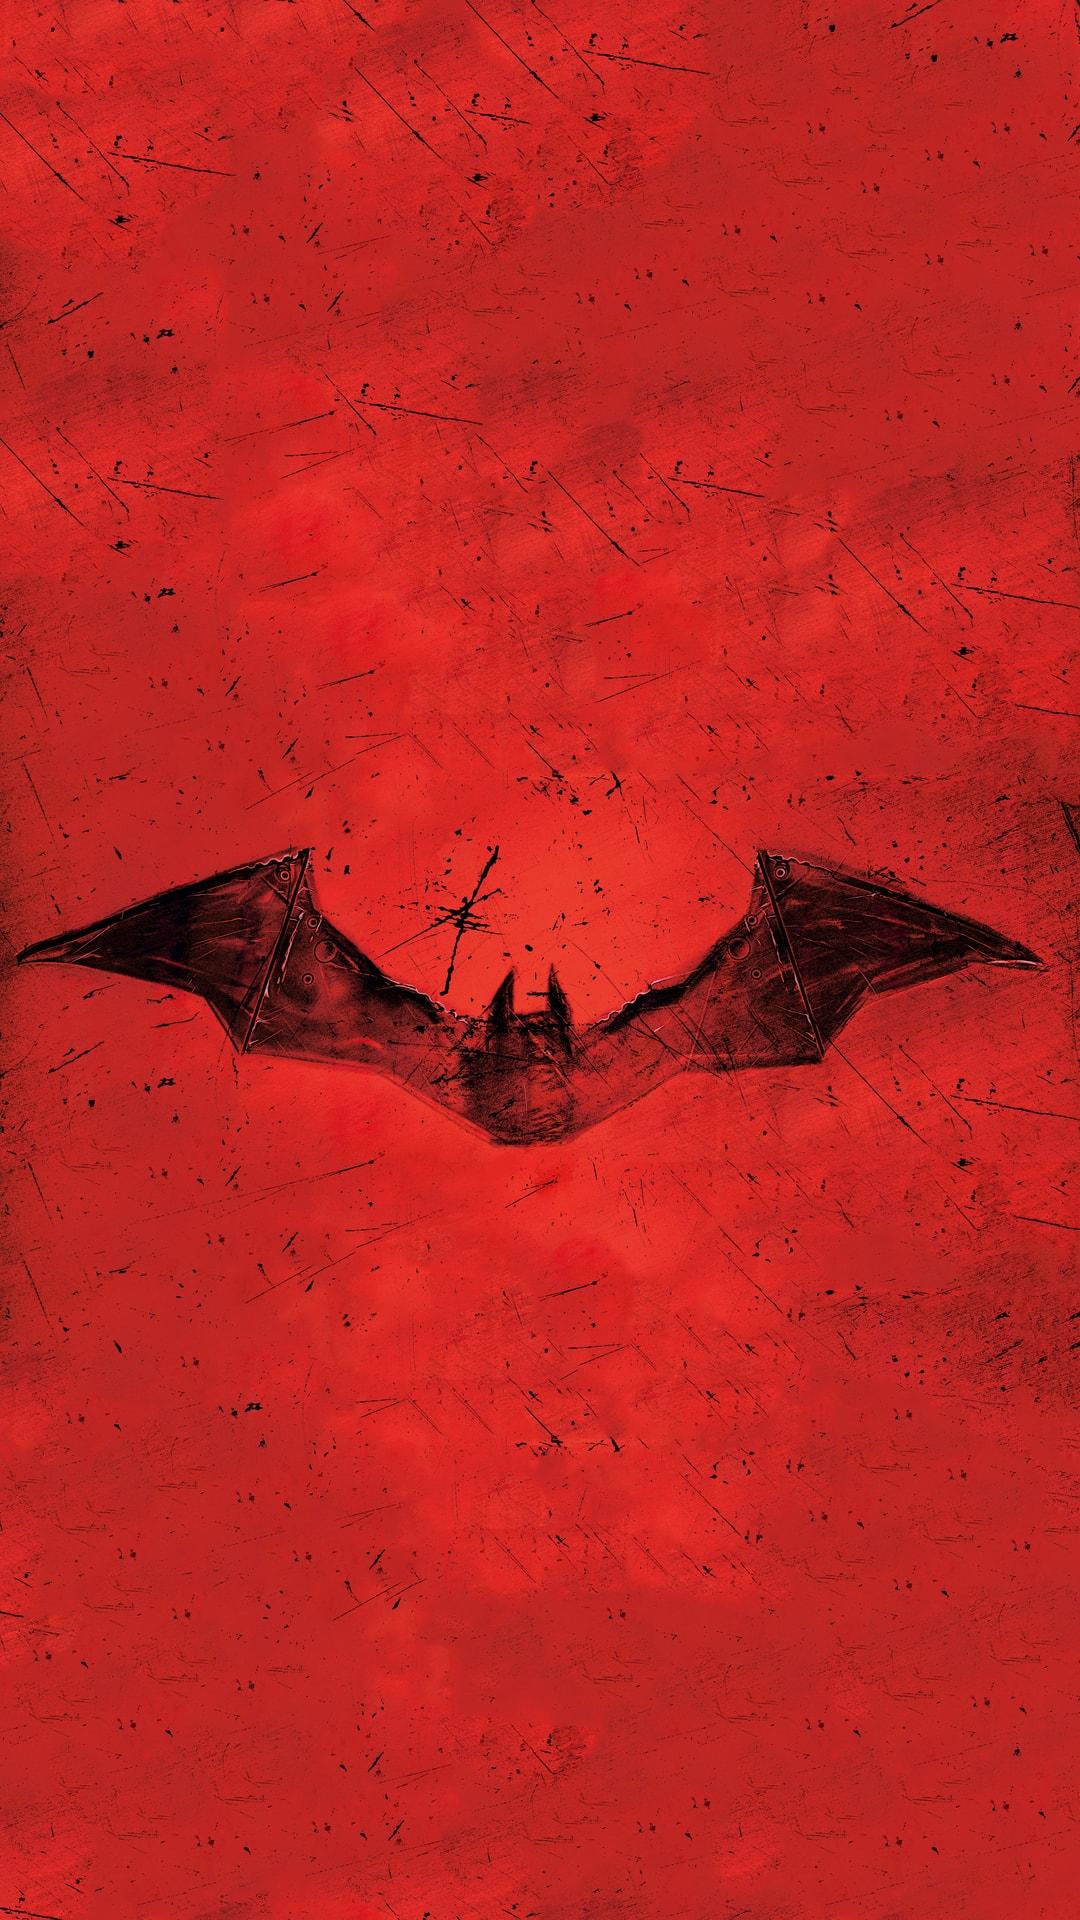 The Batman Red logo